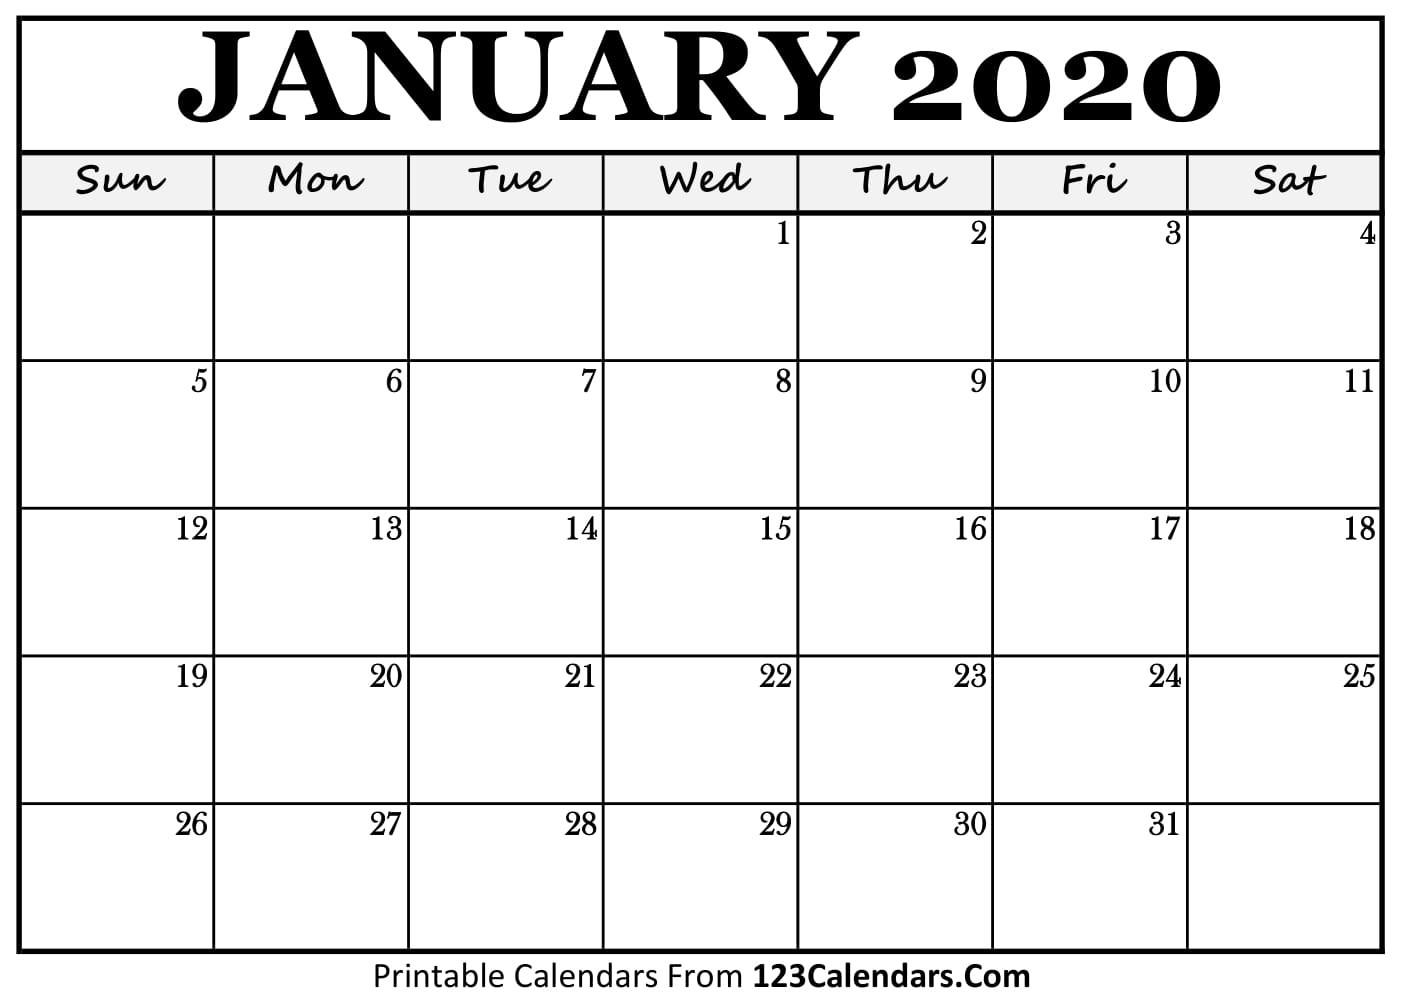 Free Printable Calendar | 123Calendars  Free Printable Editable Calendars 2020